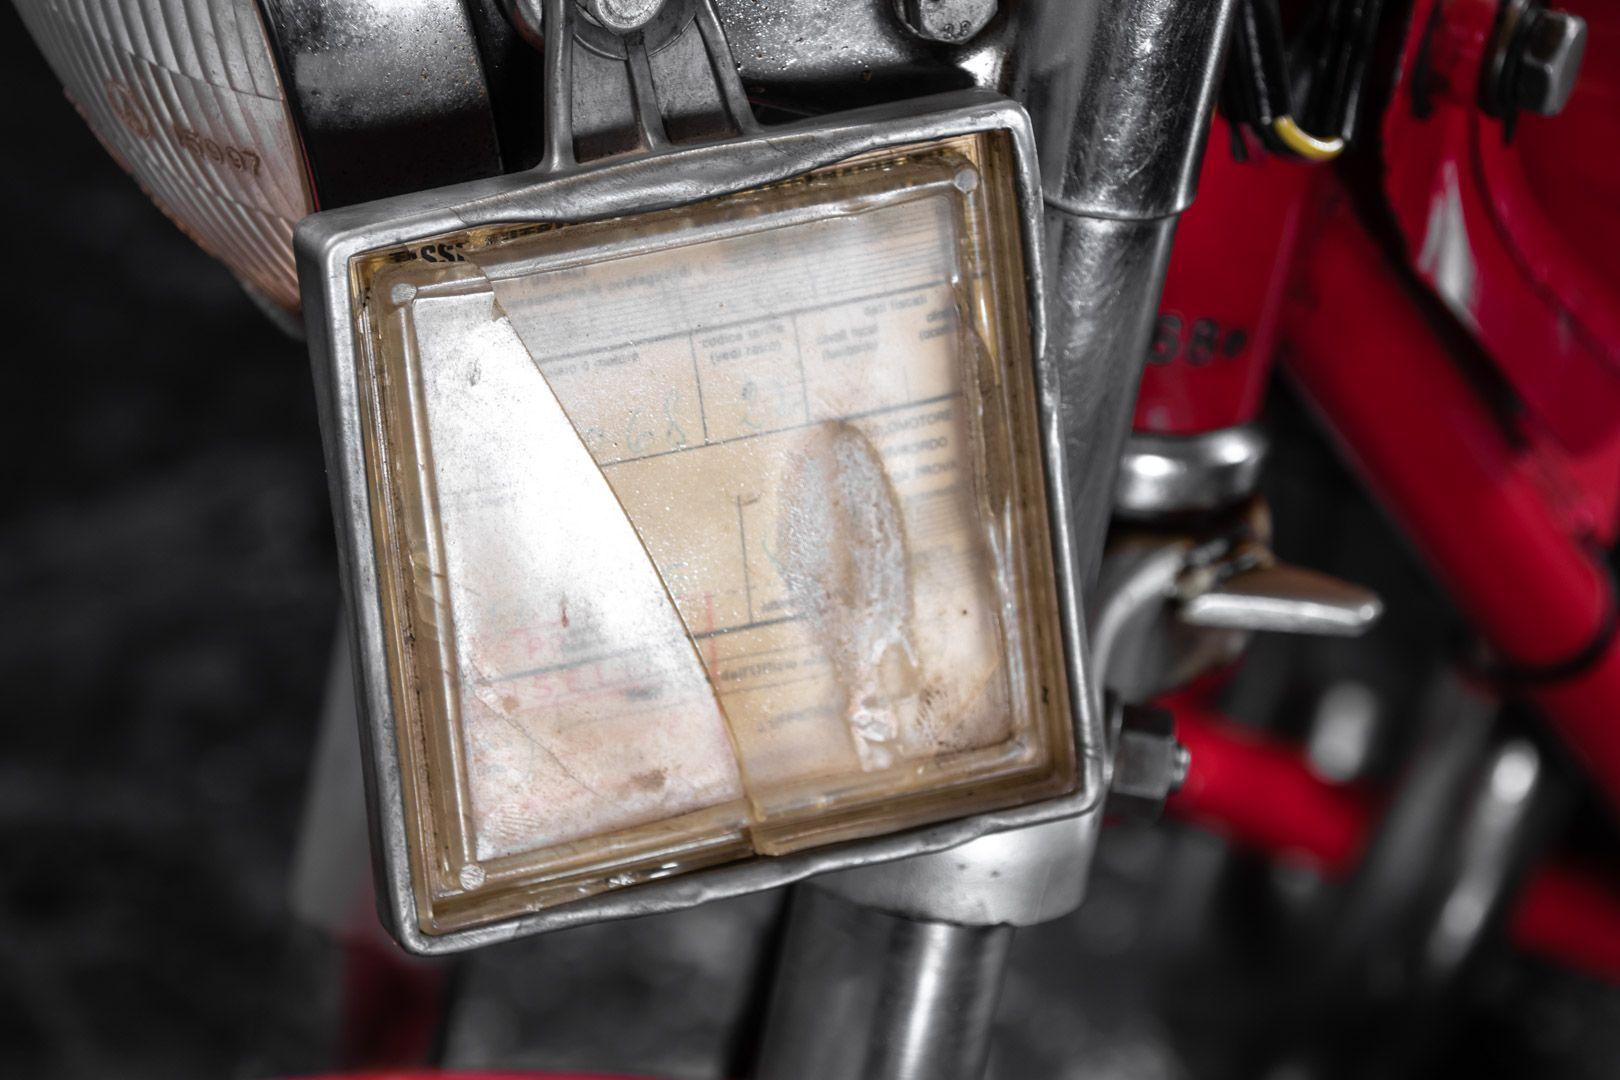 1978 Bonvicini Moto Jaguarino 50 82537